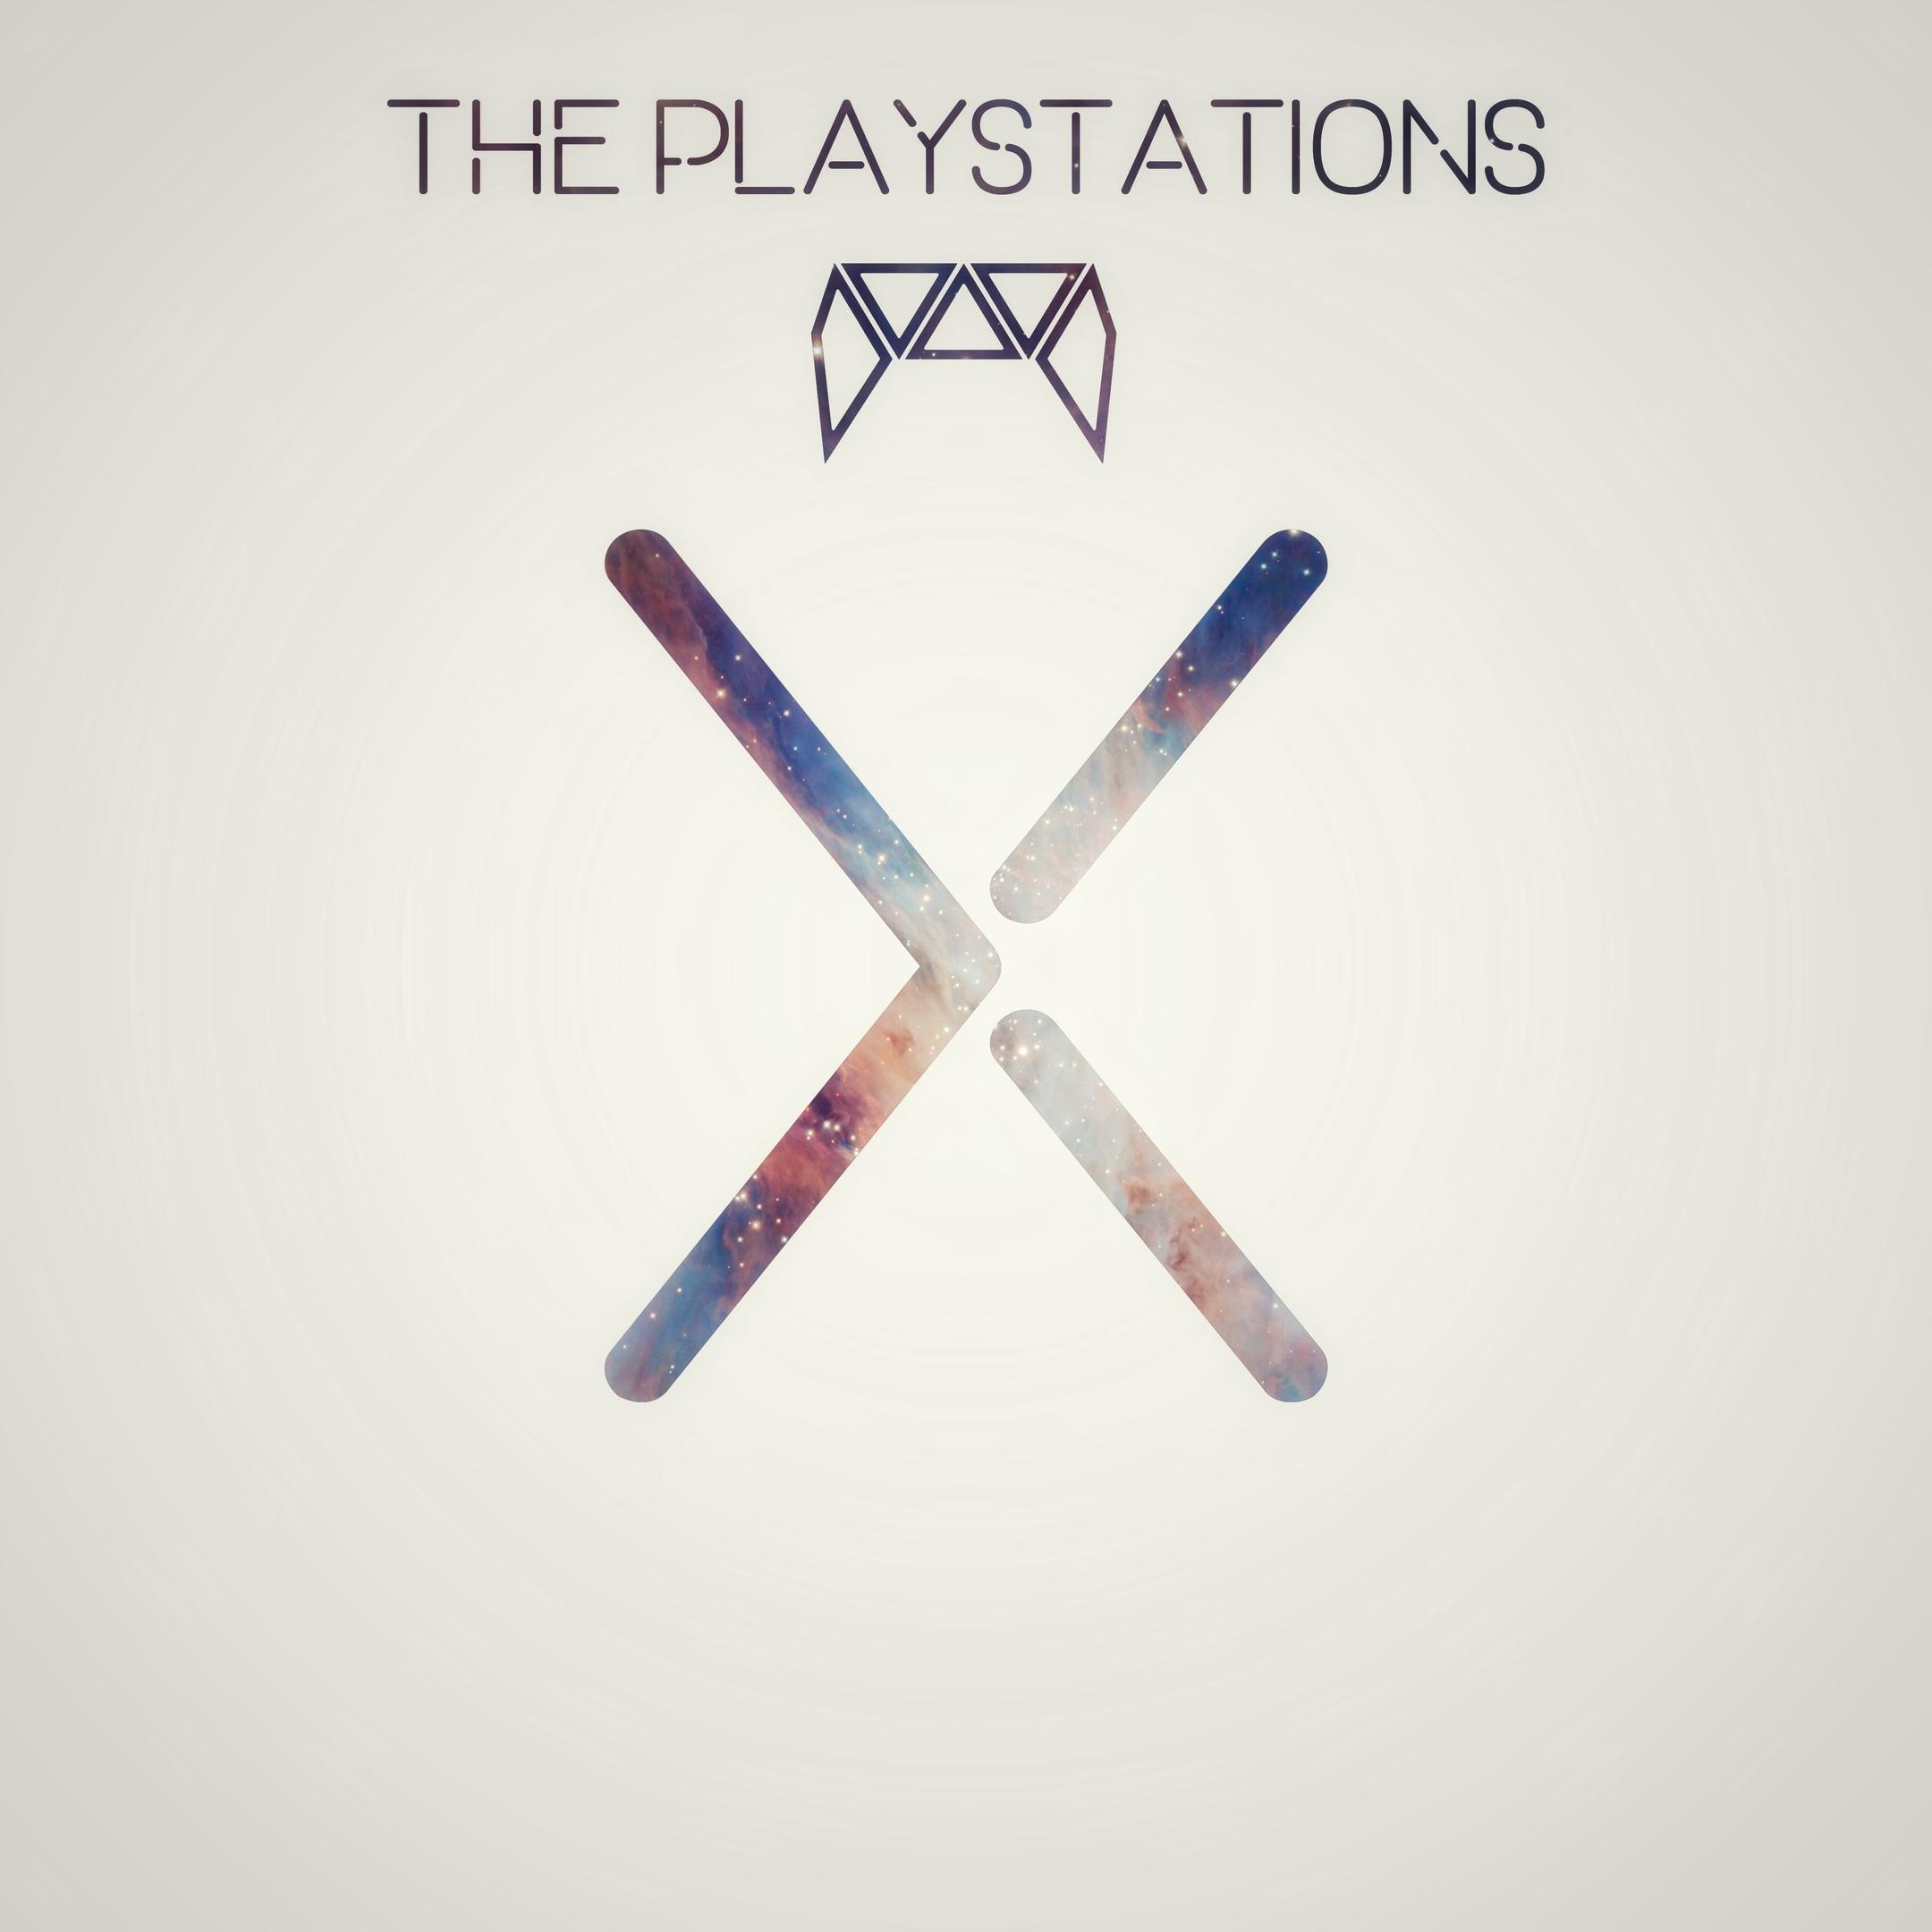 The PlayStations - X (Десять) [single] (2020)